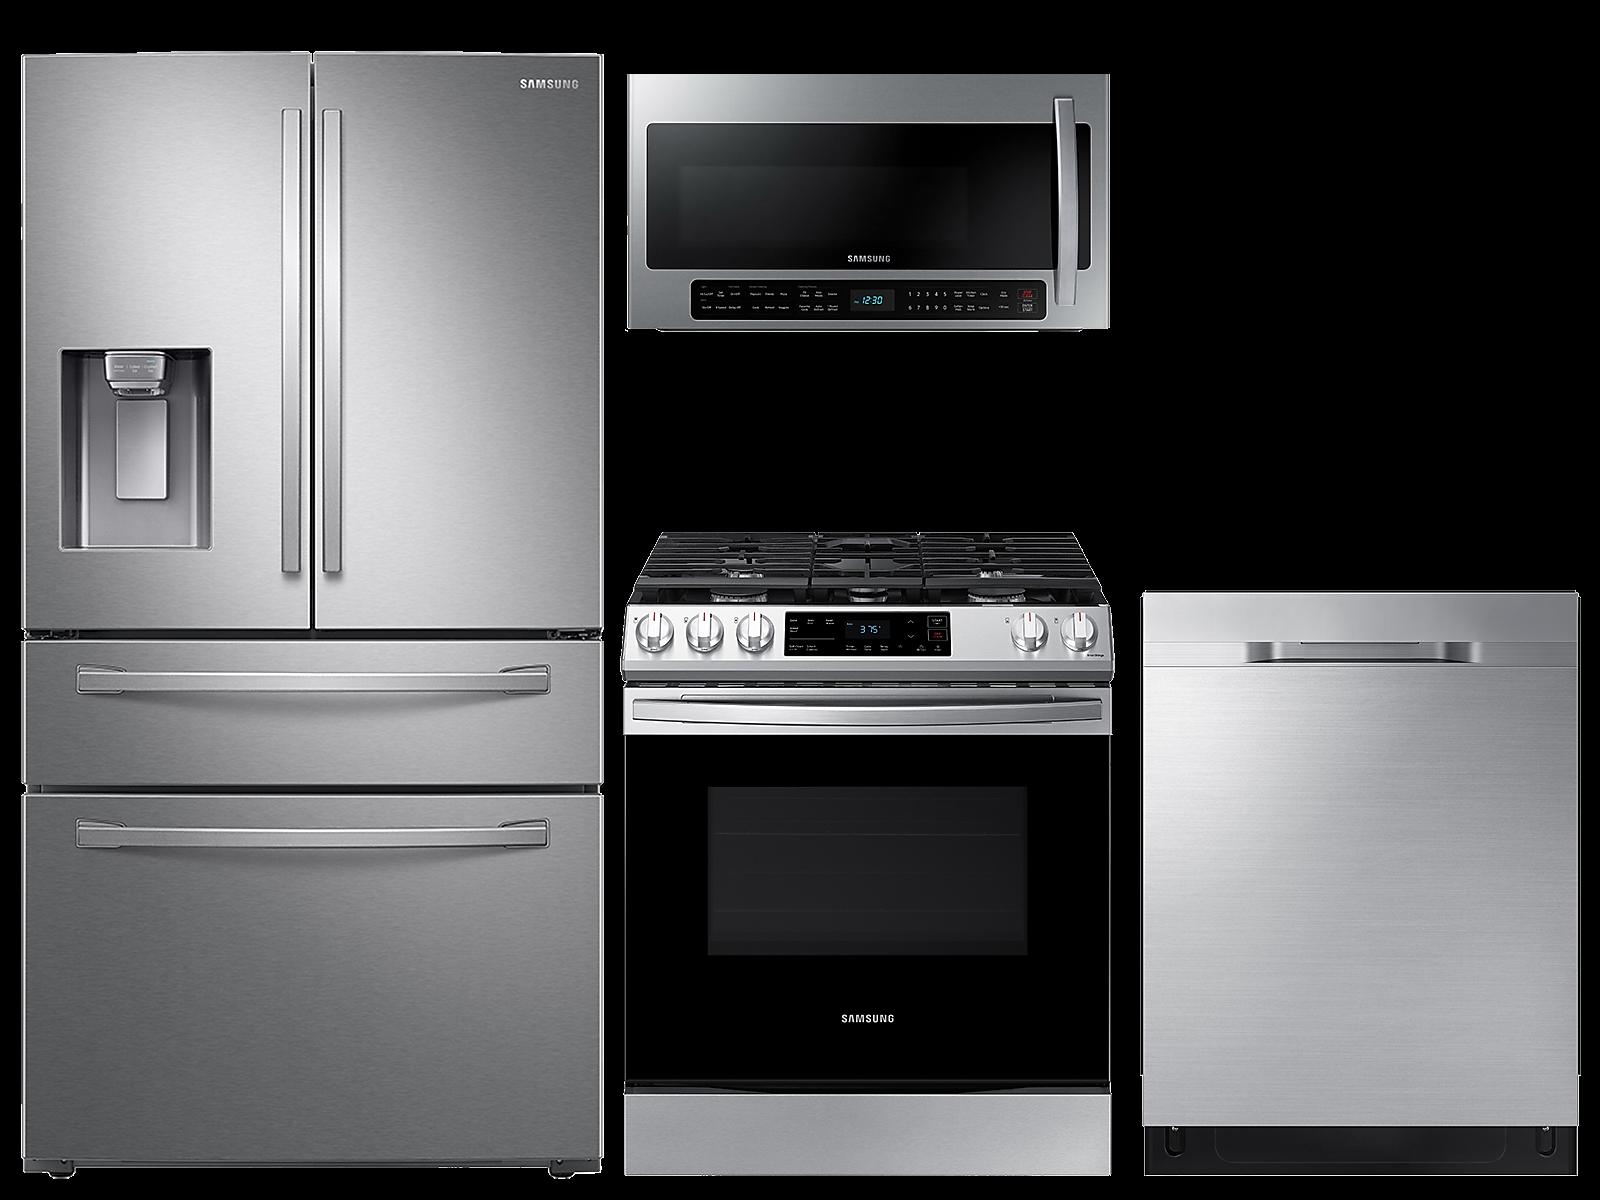 Samsung coupon: Samsung 28 cu. ft. 4-door refrigerator, gas range, 2.1 cu. ft. microwave and dishwasher package(BNDL-1612904217692)